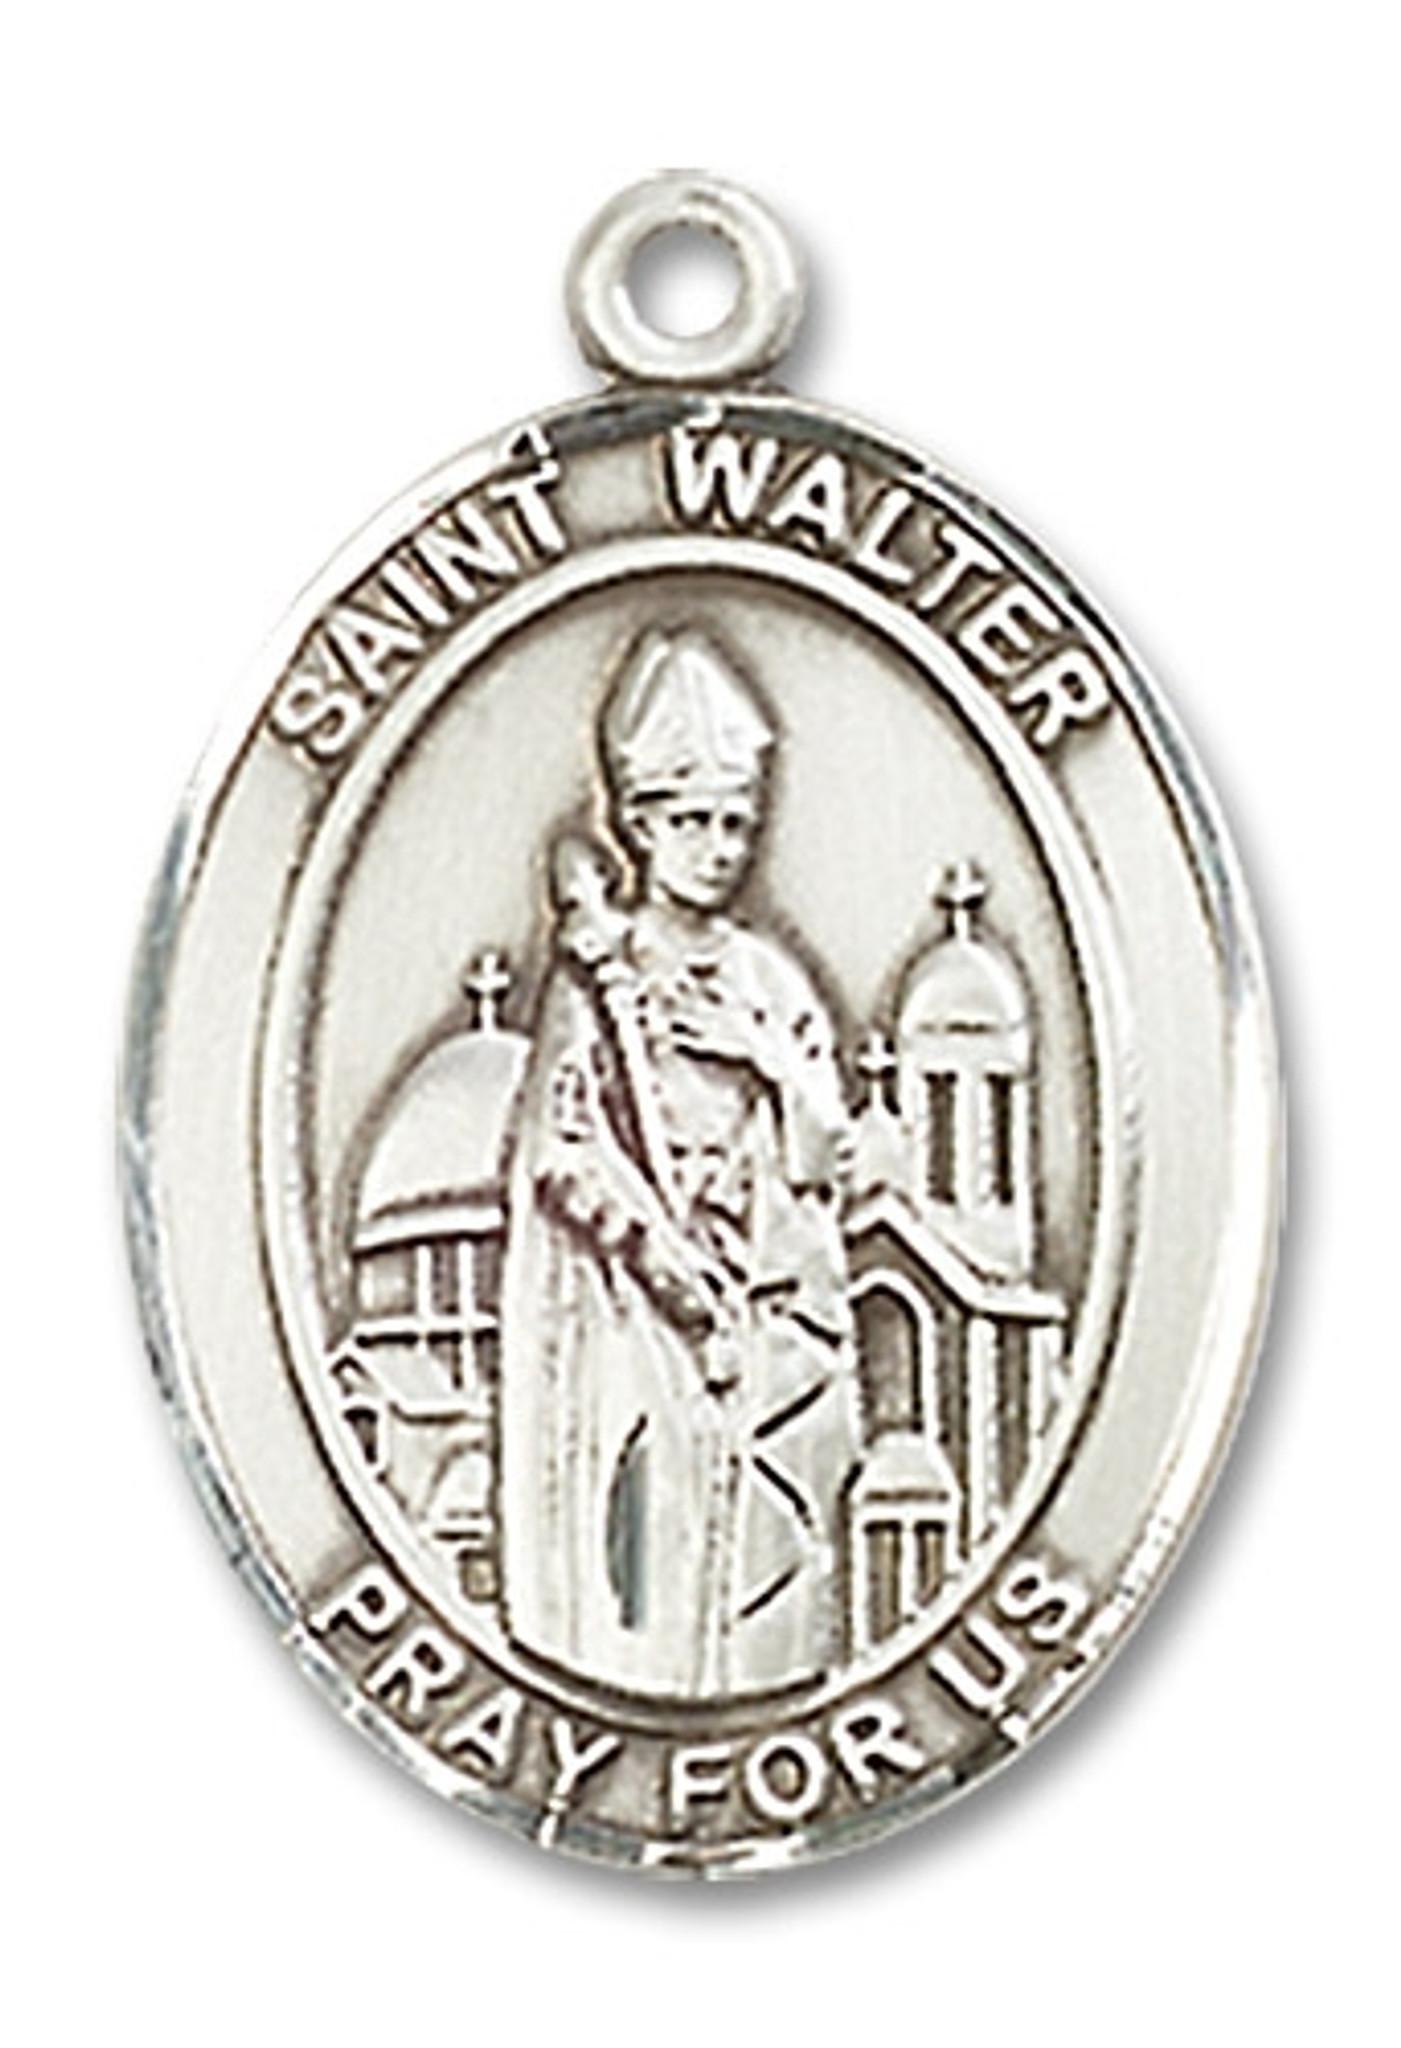 Walter of Pontnoise